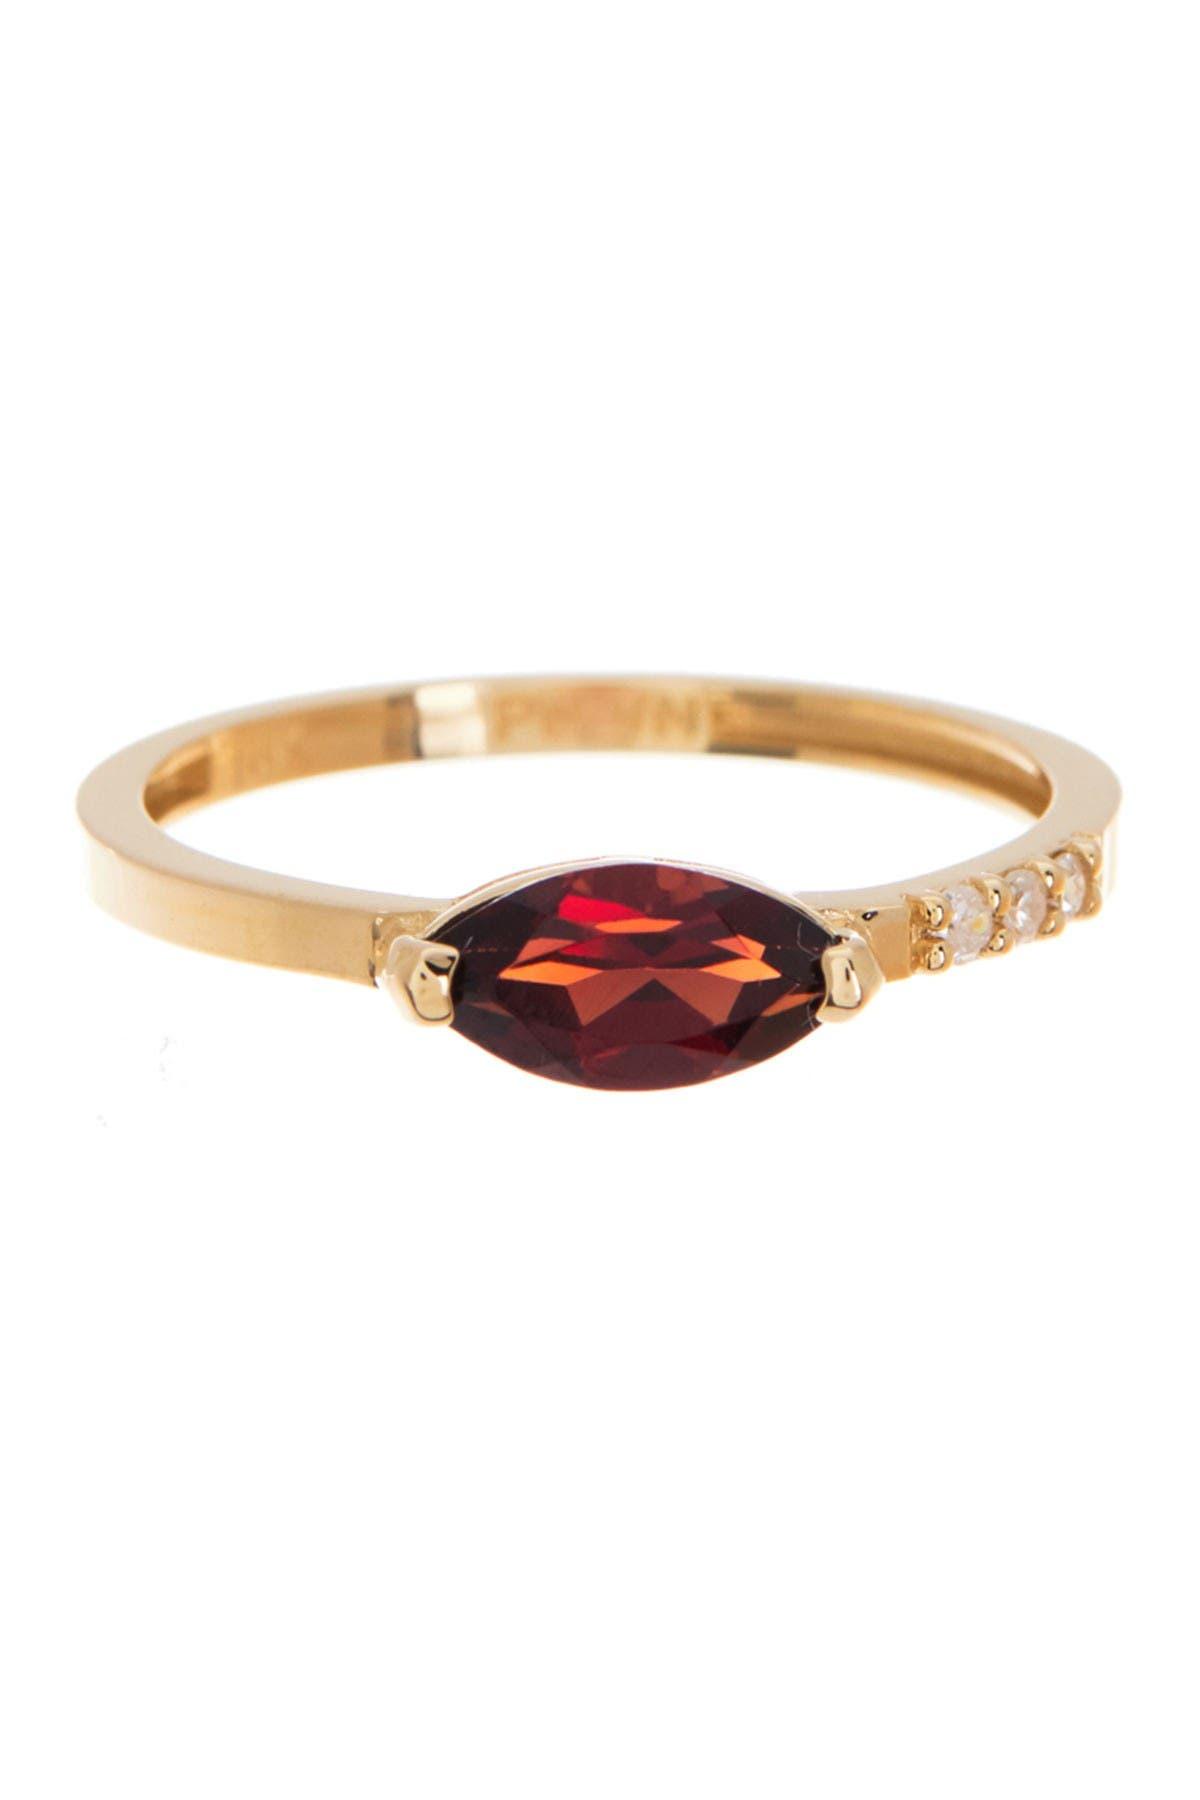 Dress Up Your Finger 14K Yelklow Gold Garnet Dianmoind Ring Size 7